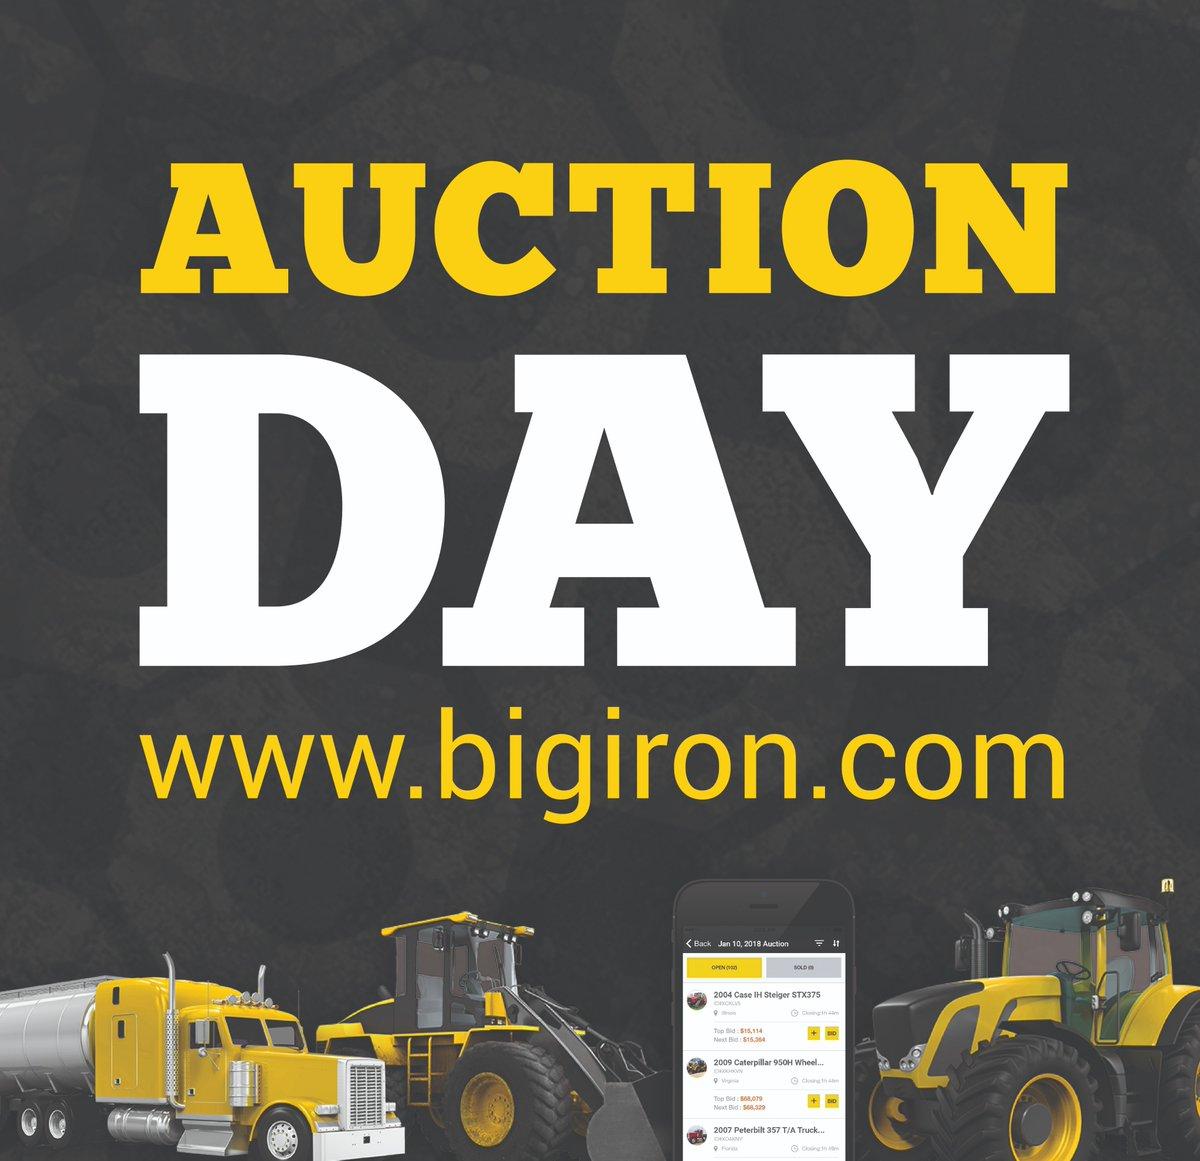 BigIron Auctions on Twitter: